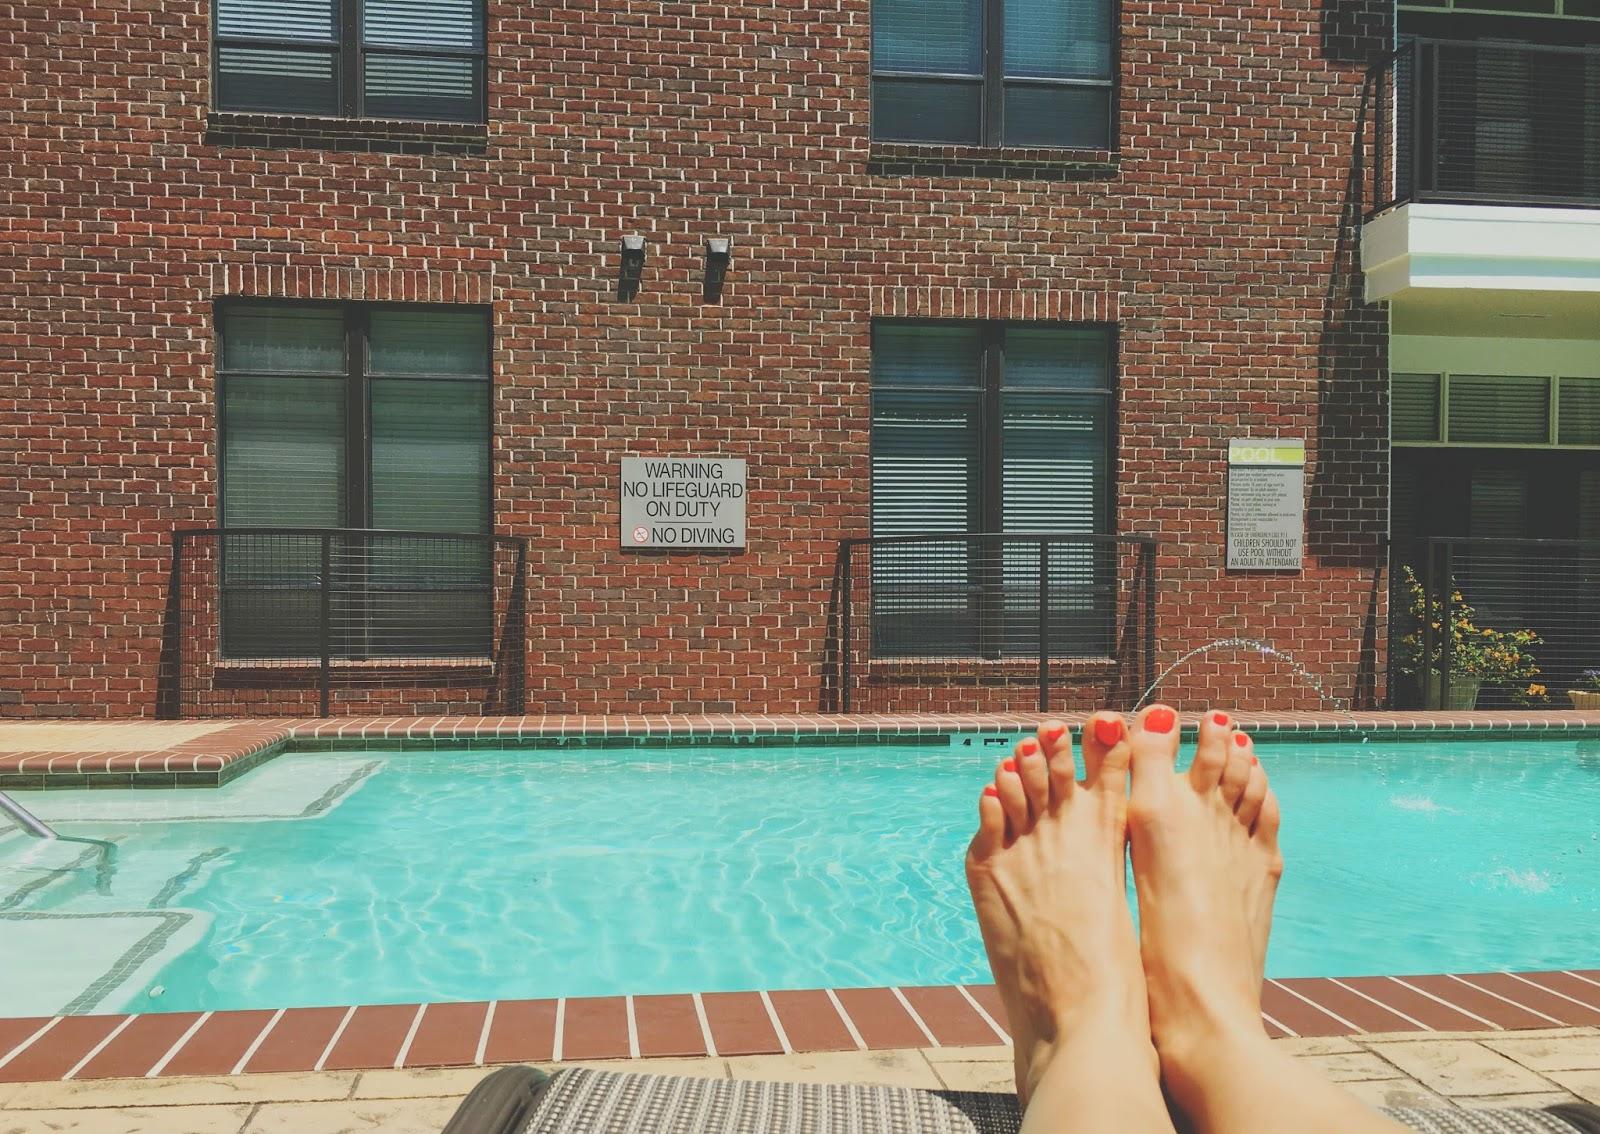 pool day in Houston, Texas